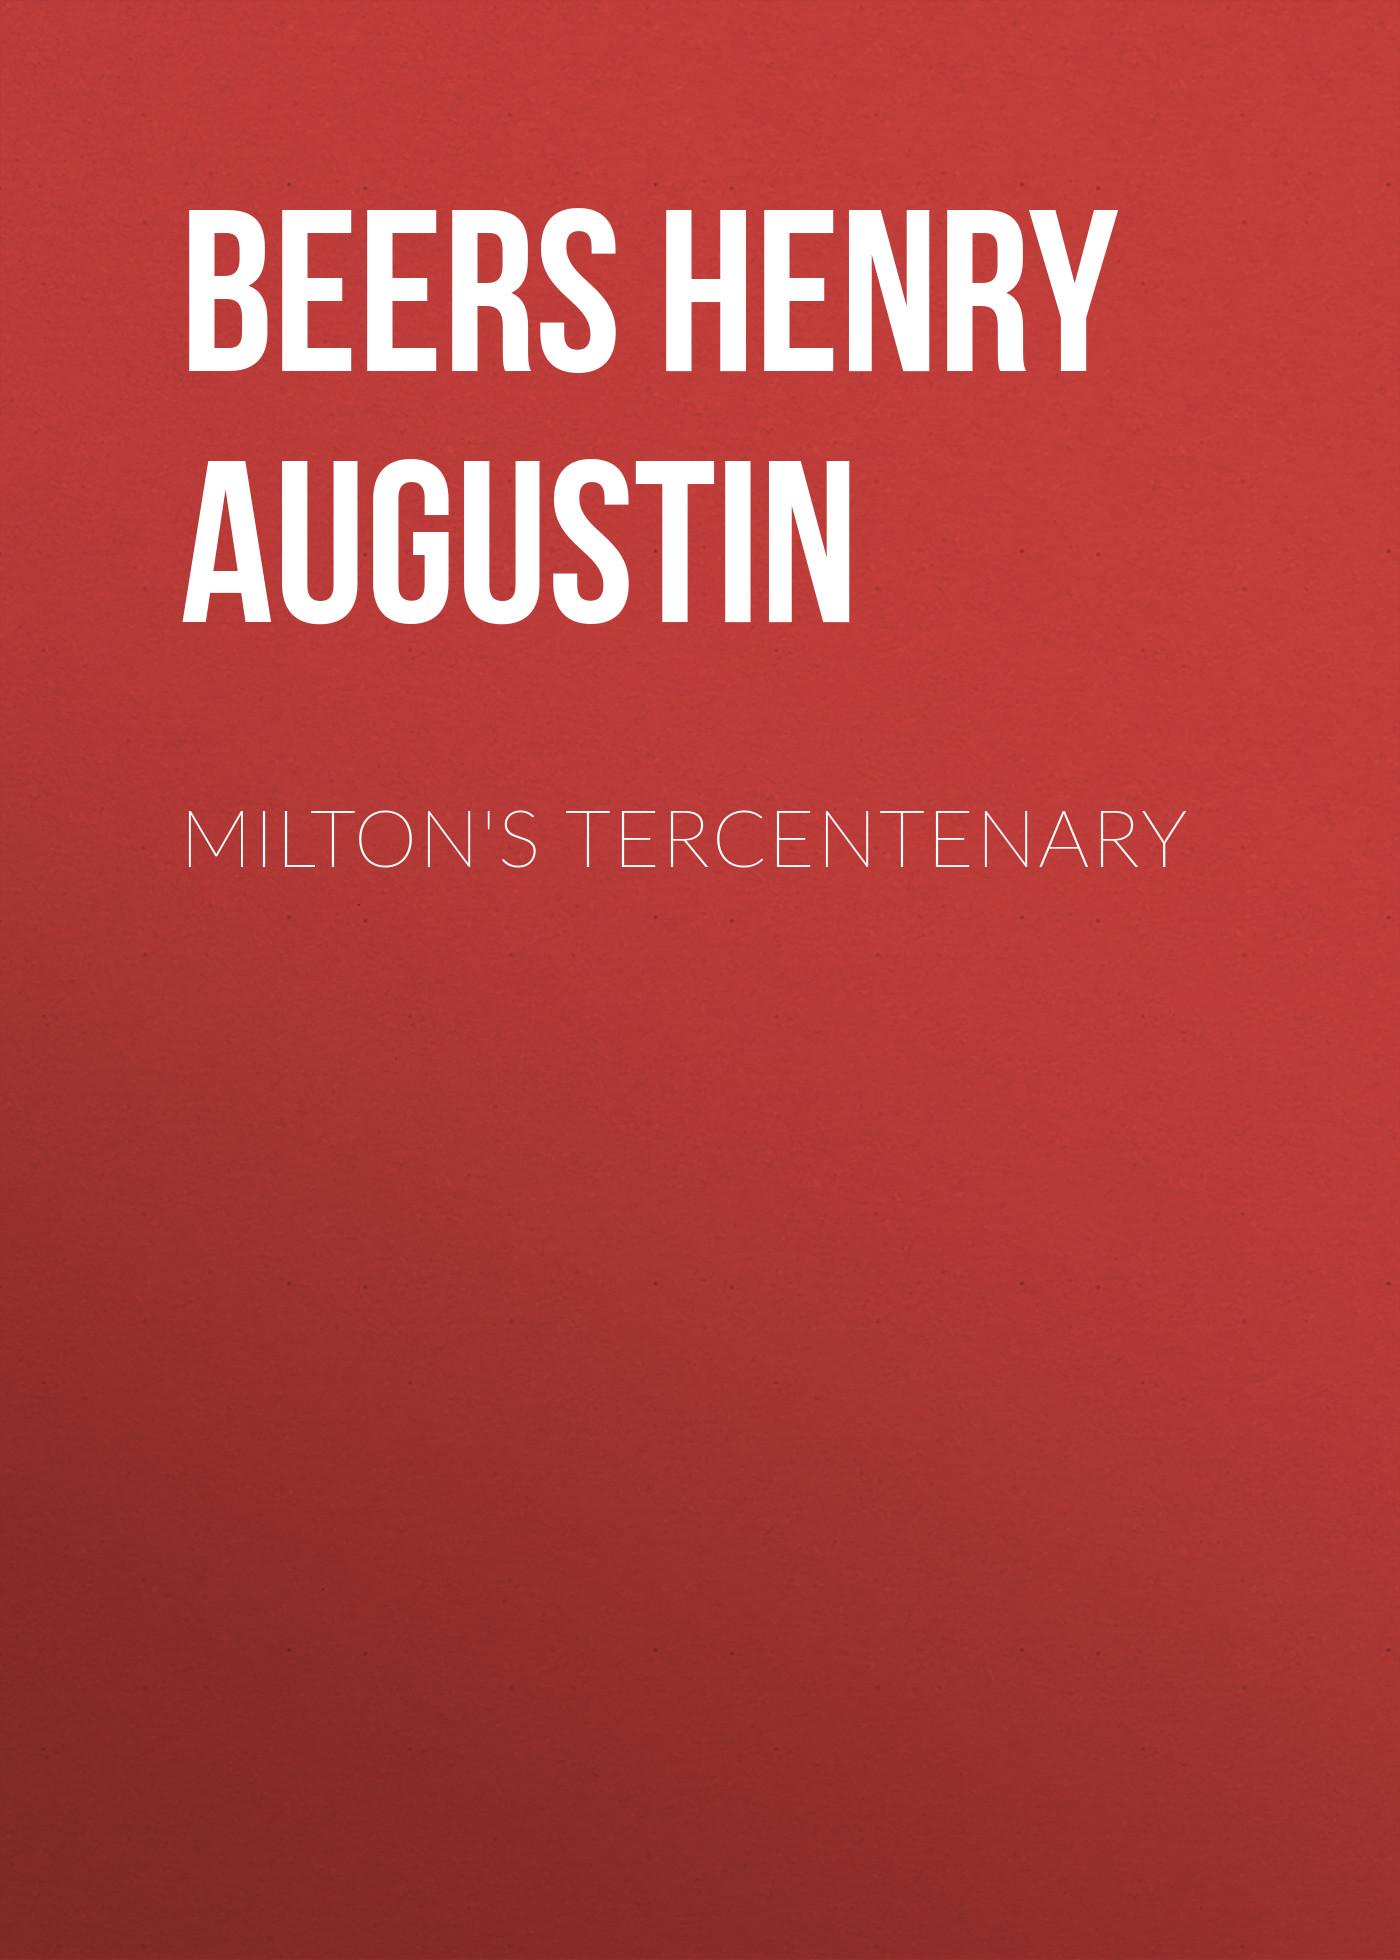 цена Beers Henry Augustin Milton's Tercentenary в интернет-магазинах